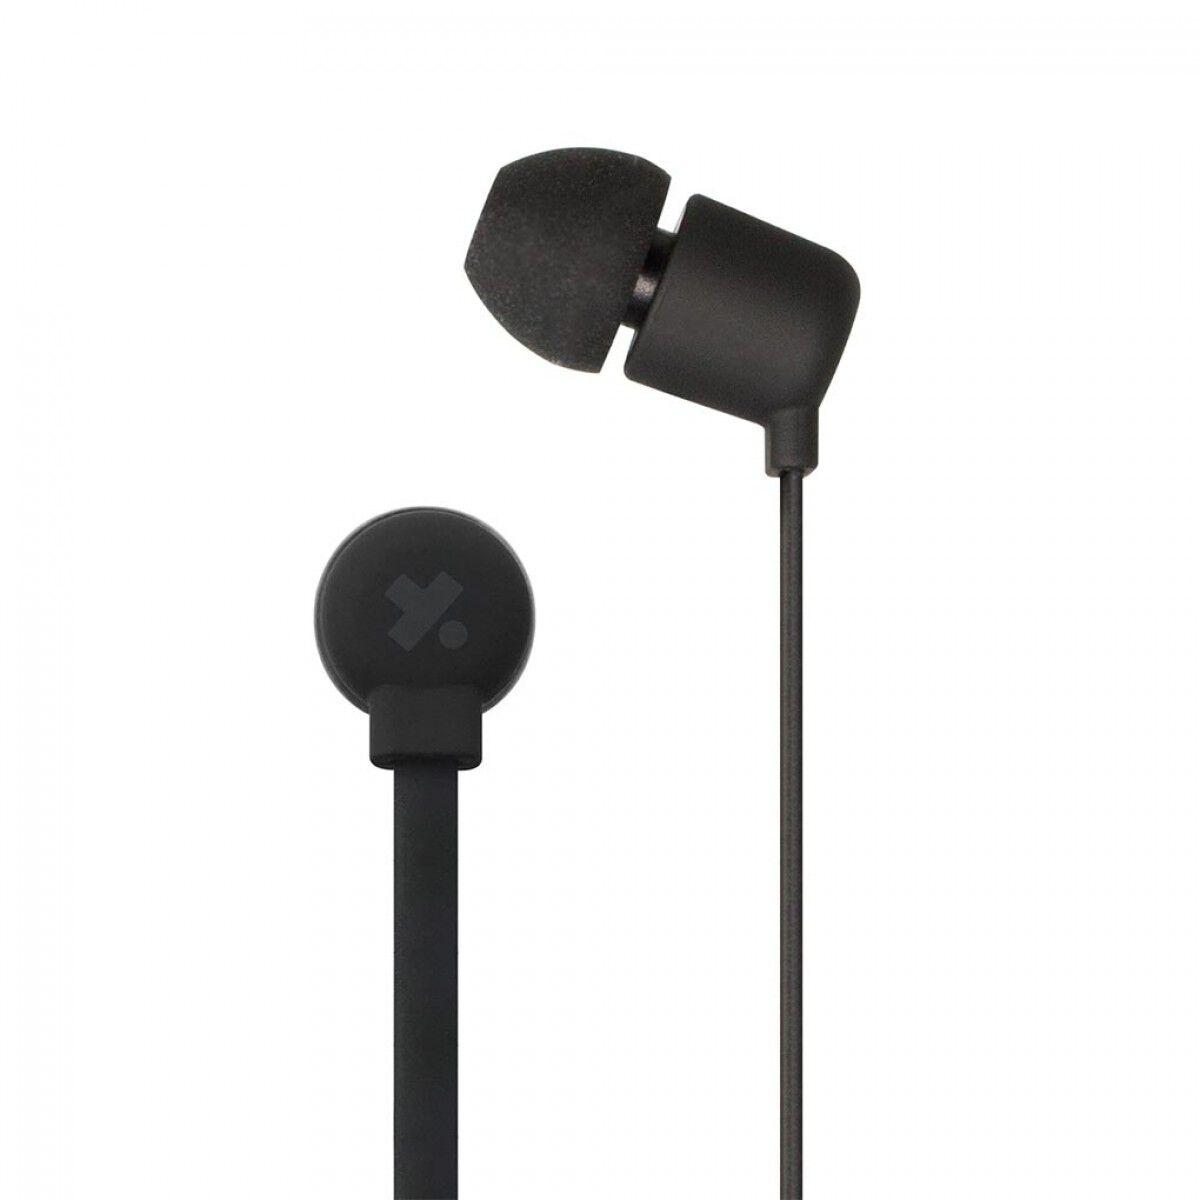 Mission™ Wireless earbuds (Black)